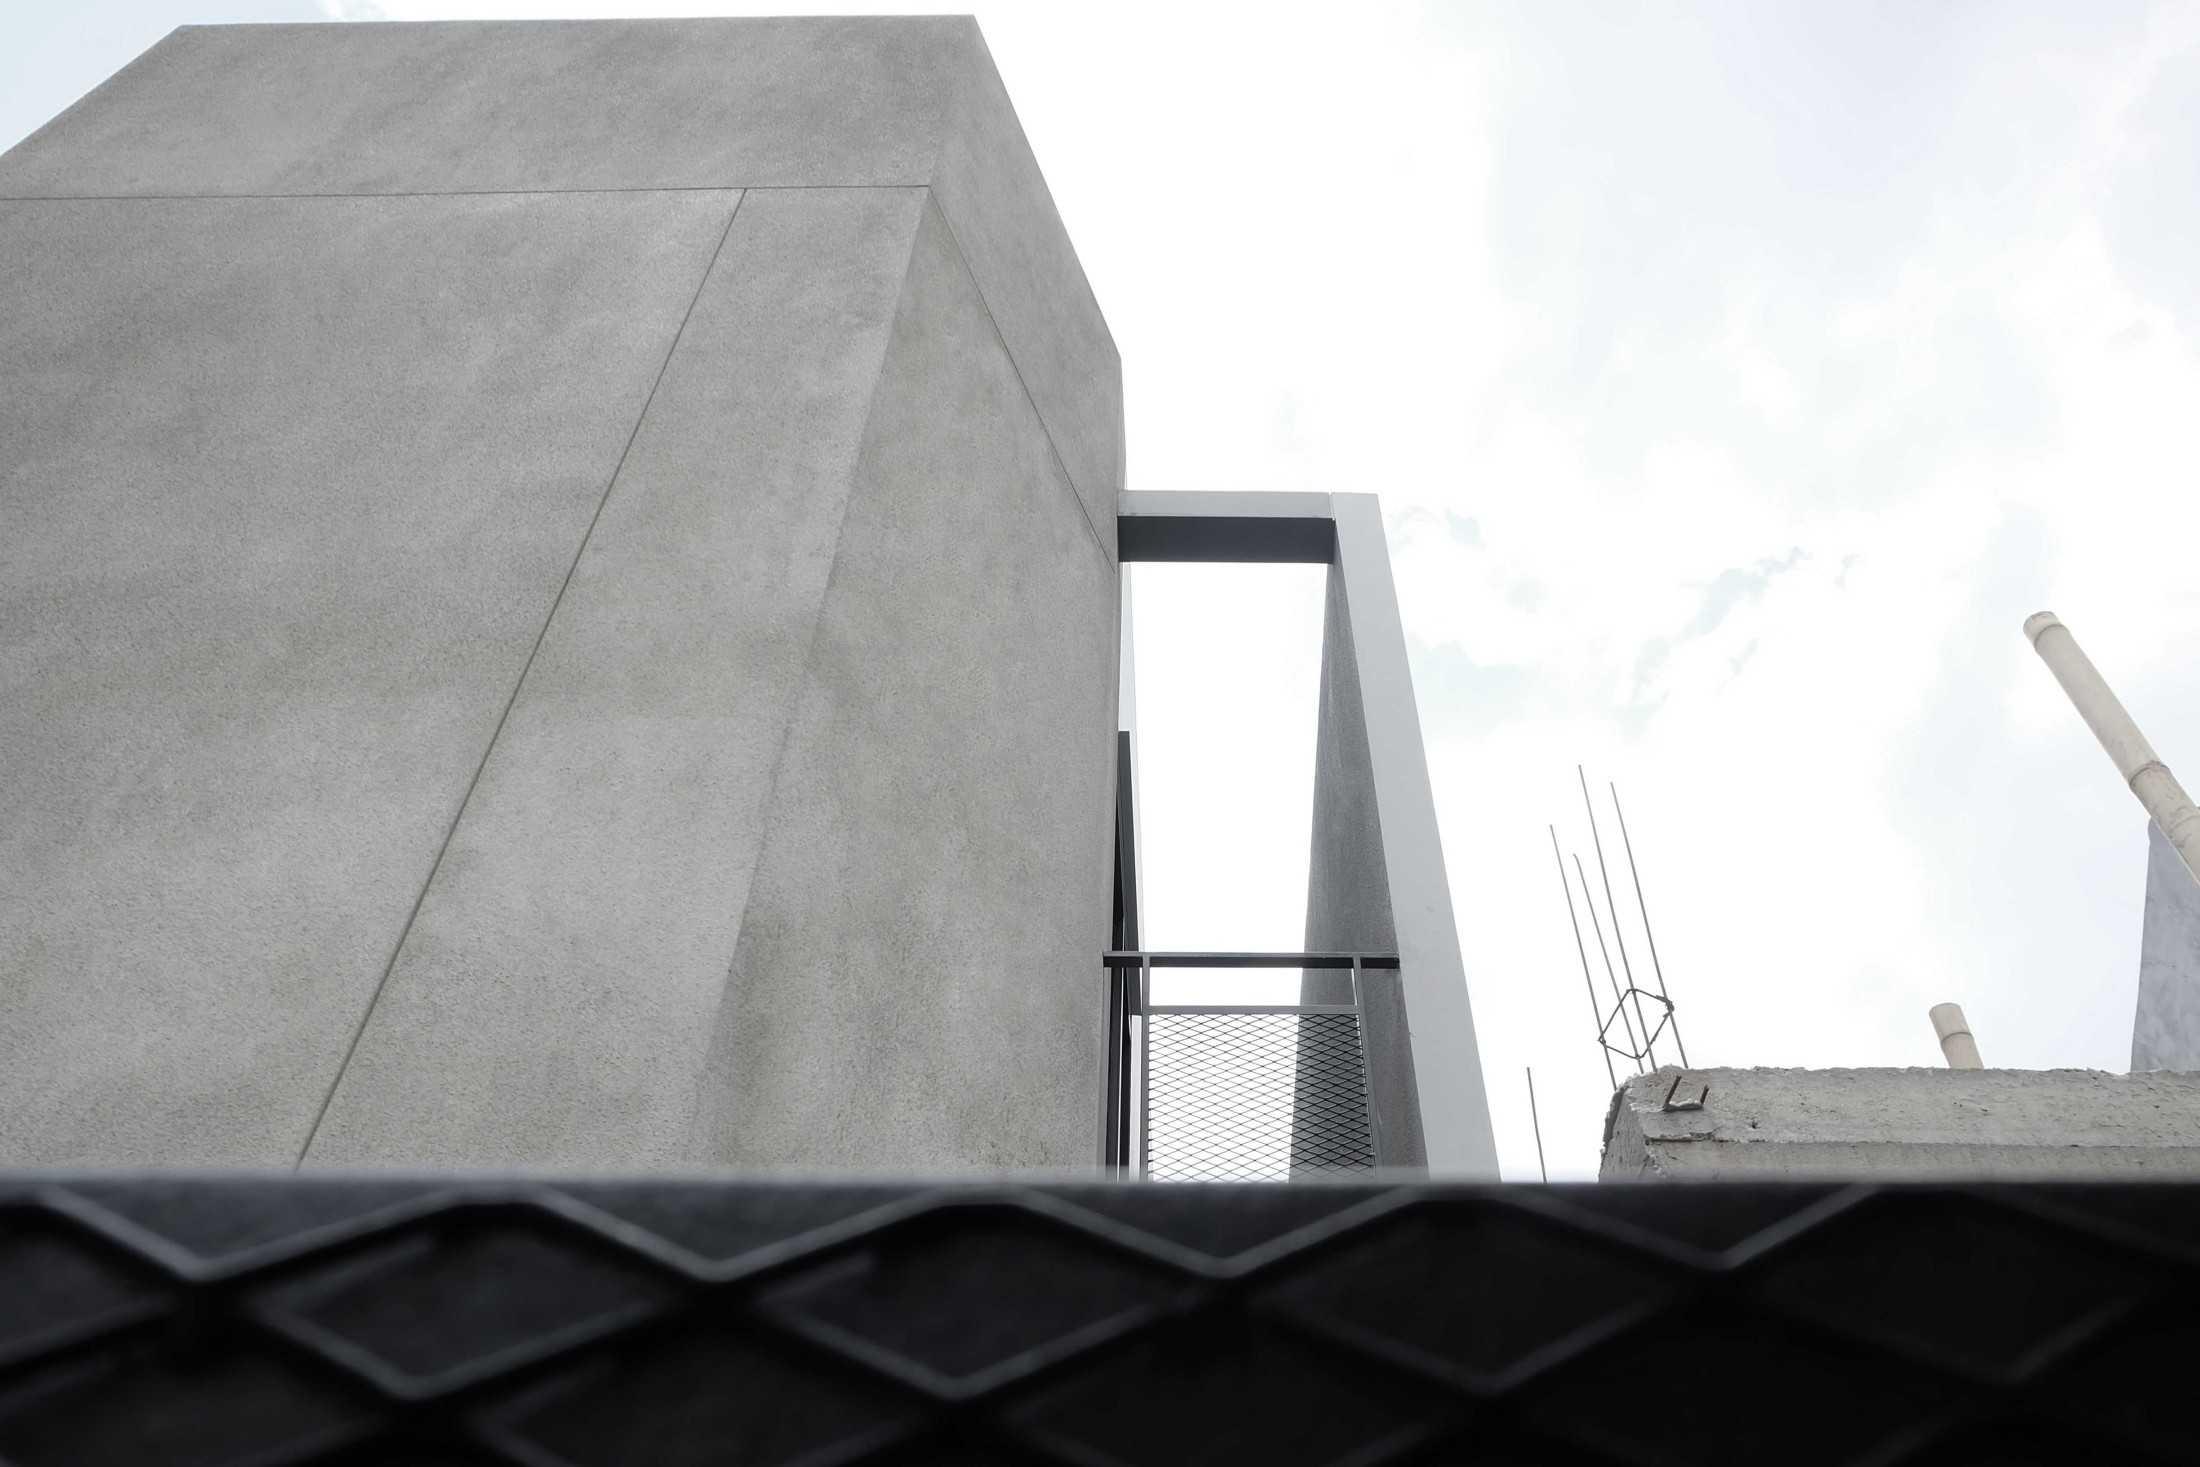 Dica Selaras Yang House Bandung, Kota Bandung, Jawa Barat, Indonesia Bandung, Kota Bandung, Jawa Barat, Indonesia Dica-Selaras-Yang-House  62832